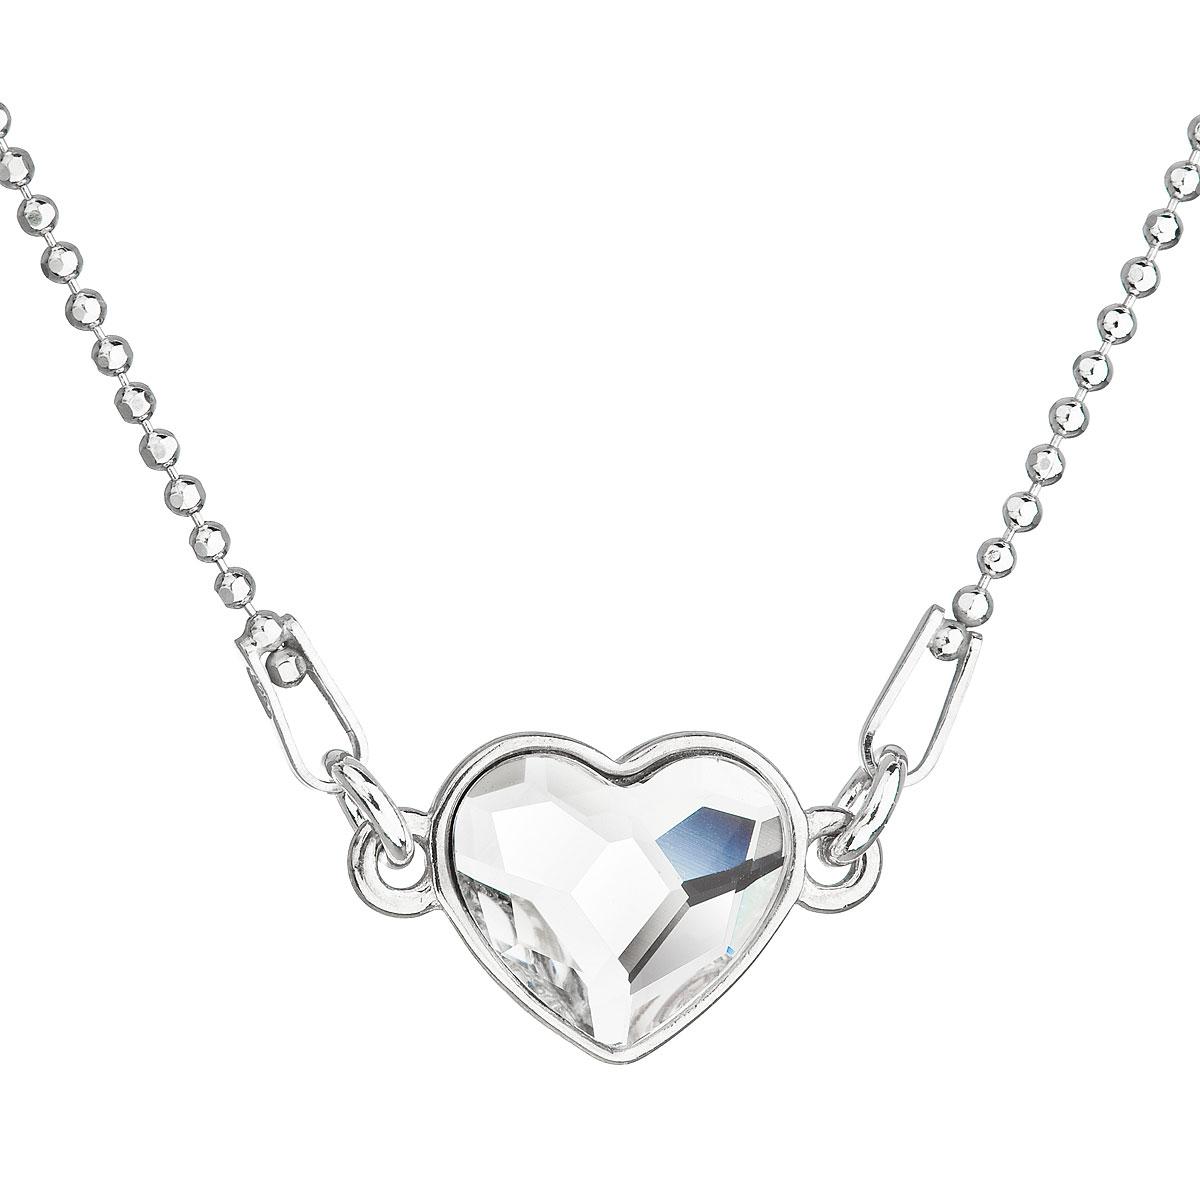 Strieborný náhrdelník s krištálom Swarovski biele srdce 32061.1